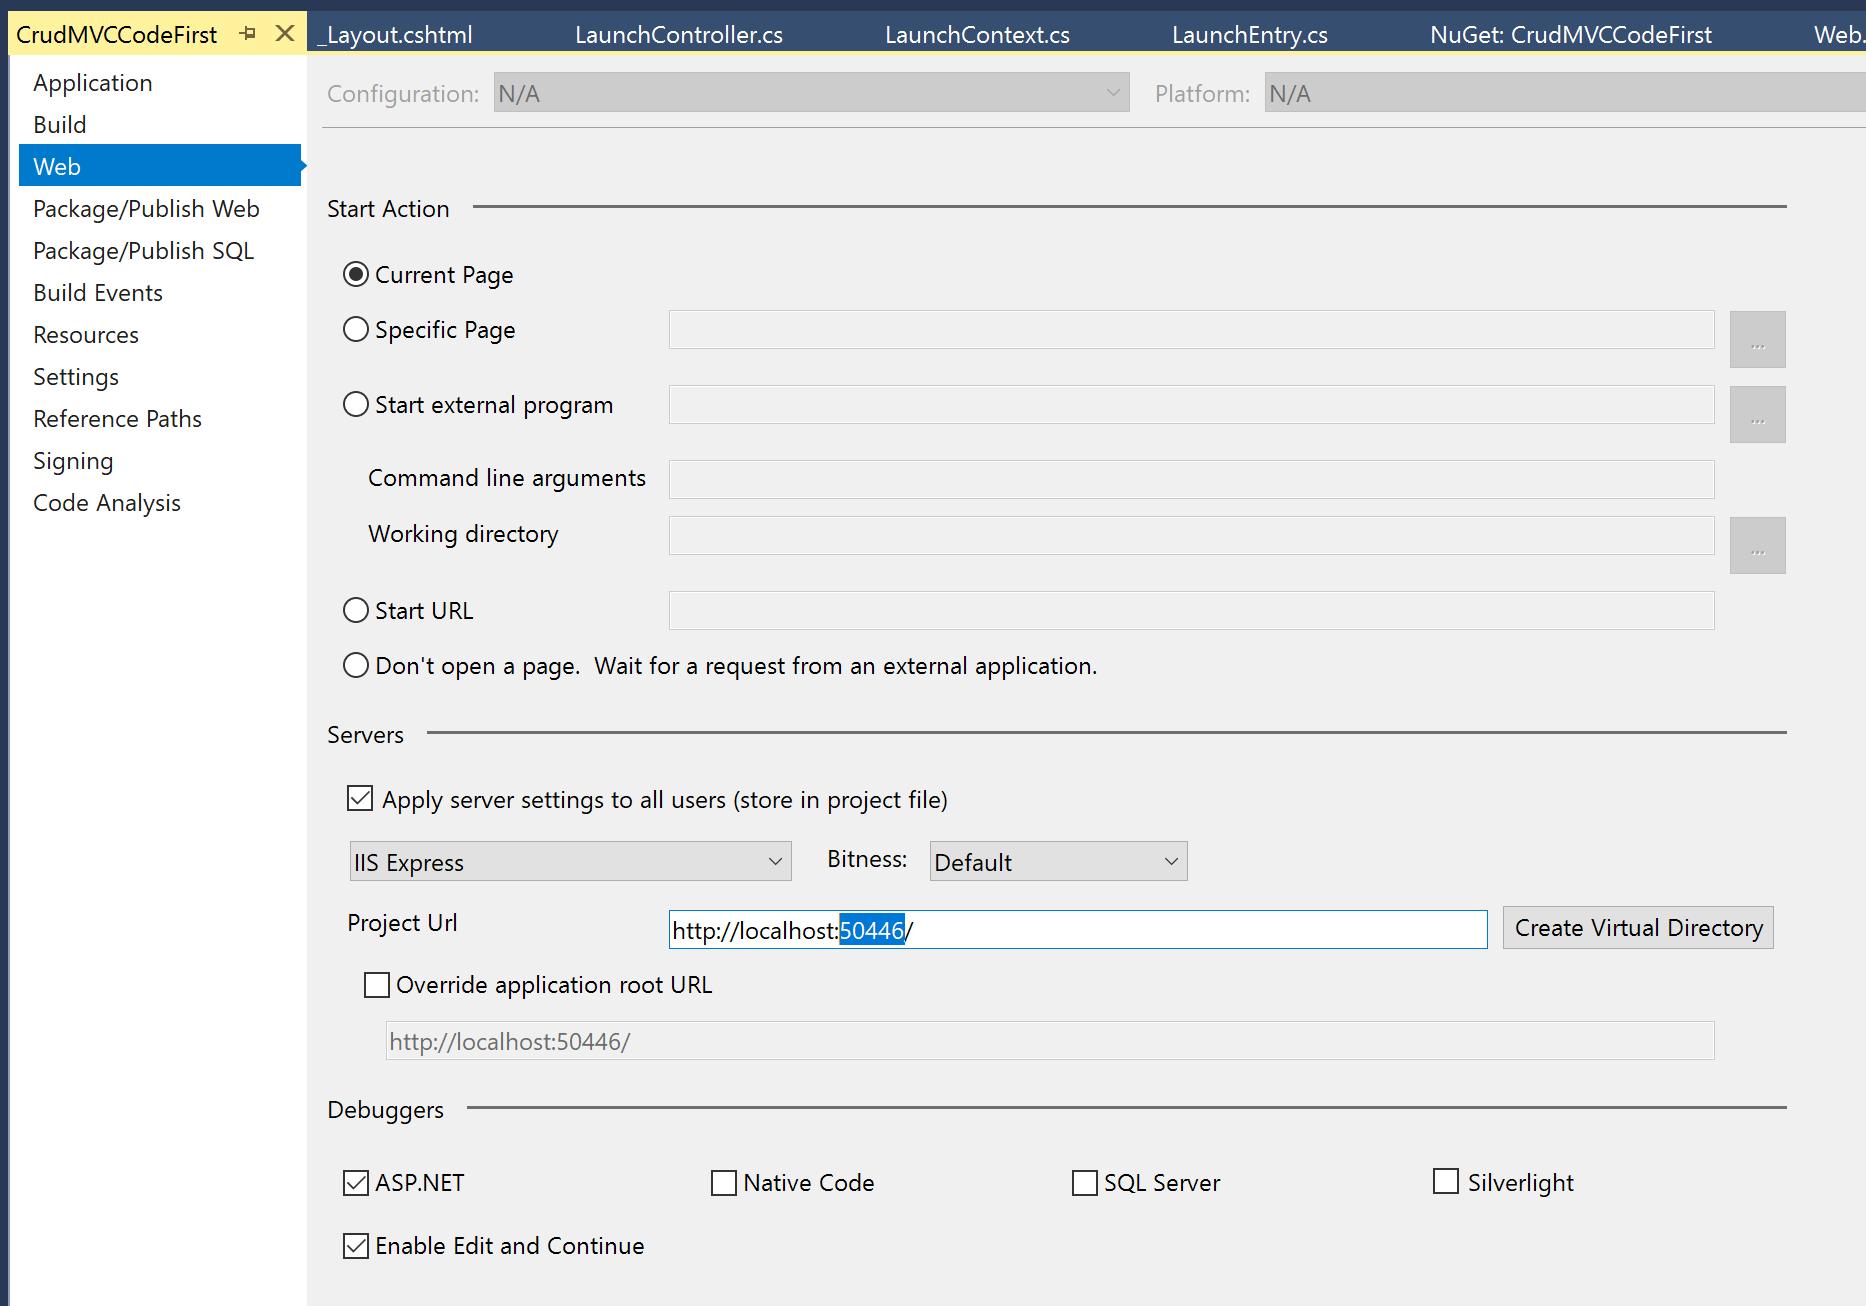 Build a CRUD App with ASP NET MVC and Entity Framework